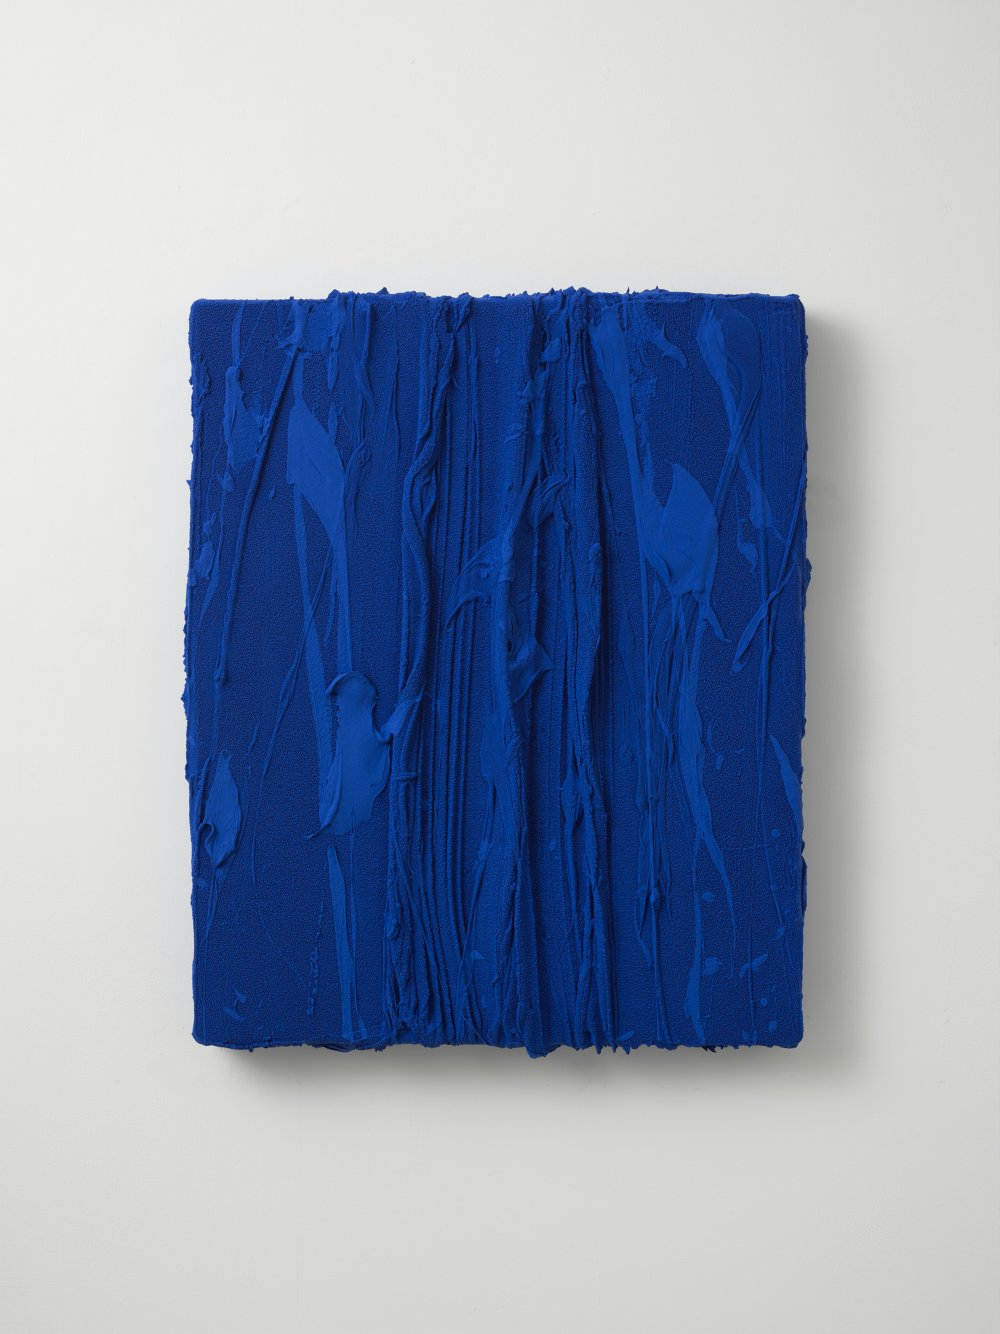 Untitled (Oriental blue)